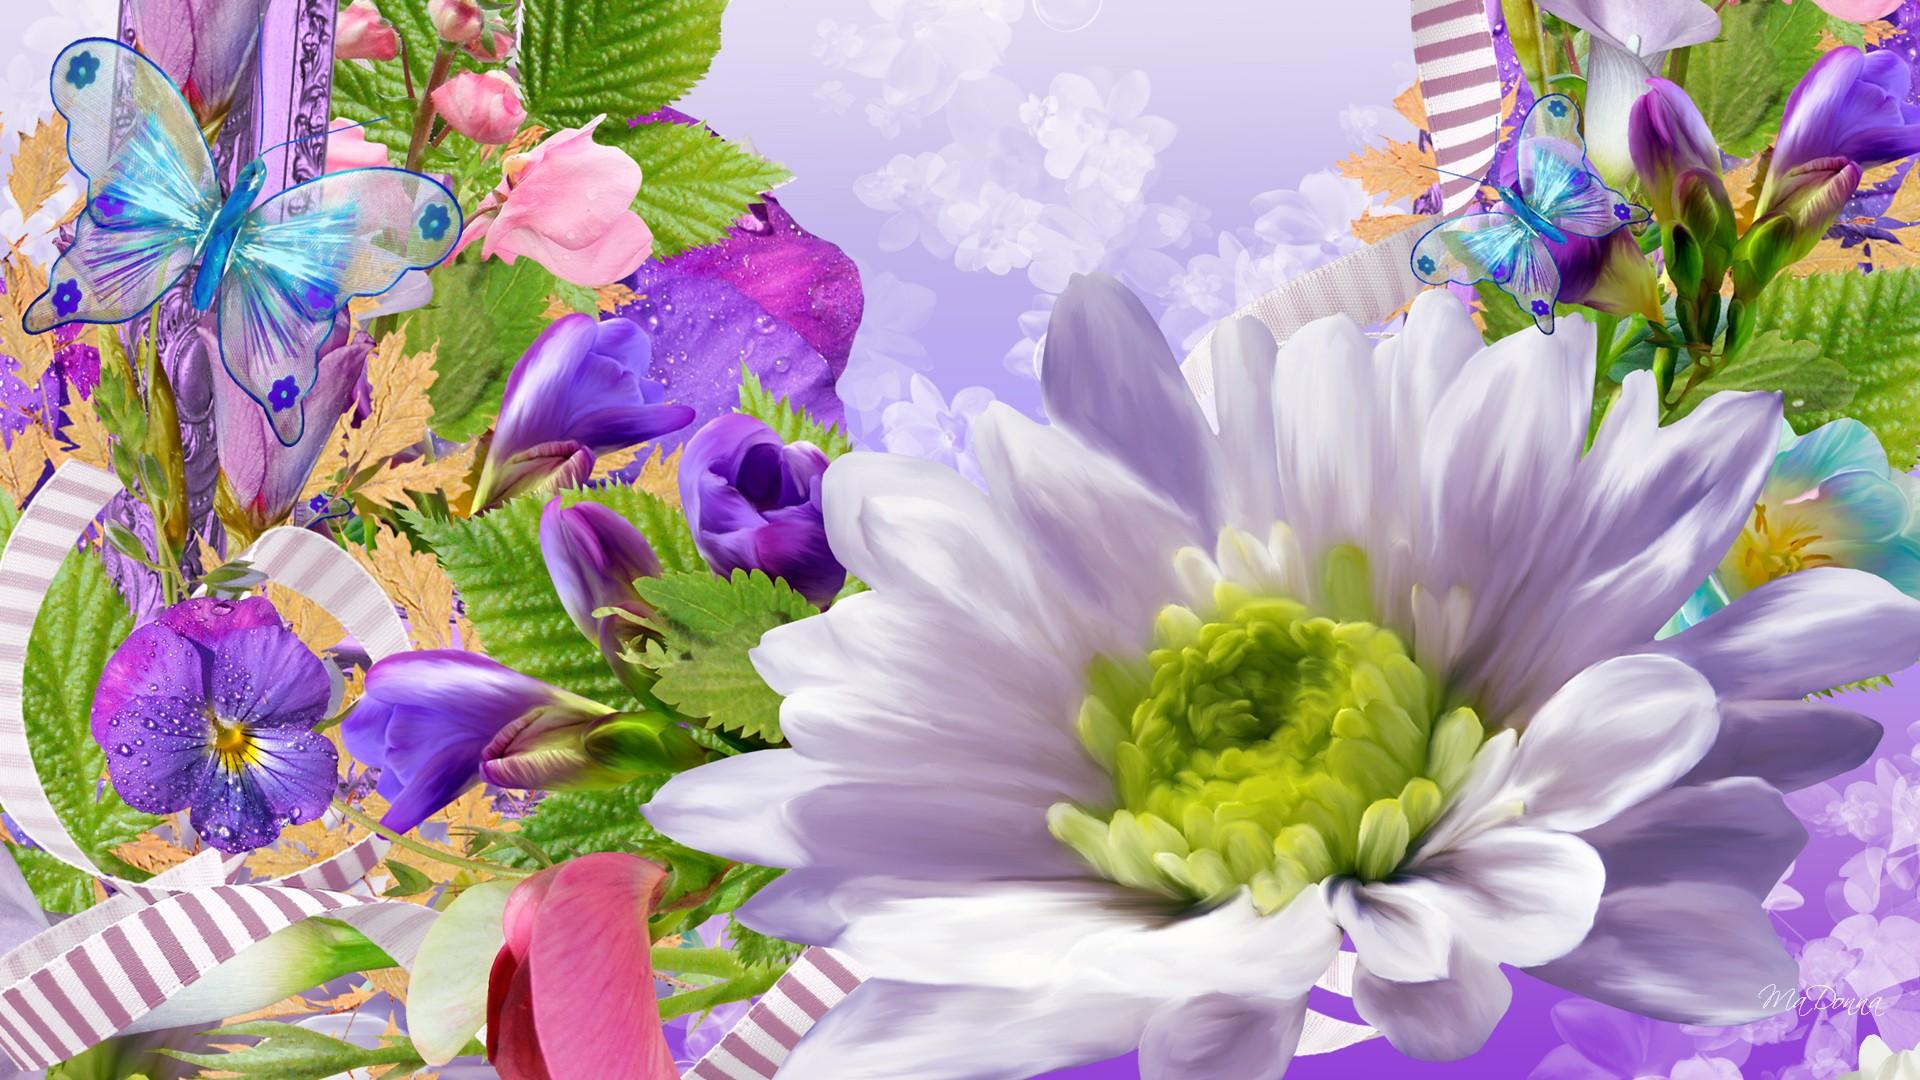 Desktop Flowers Wallpaper Backgrounds Sf Wallpaper